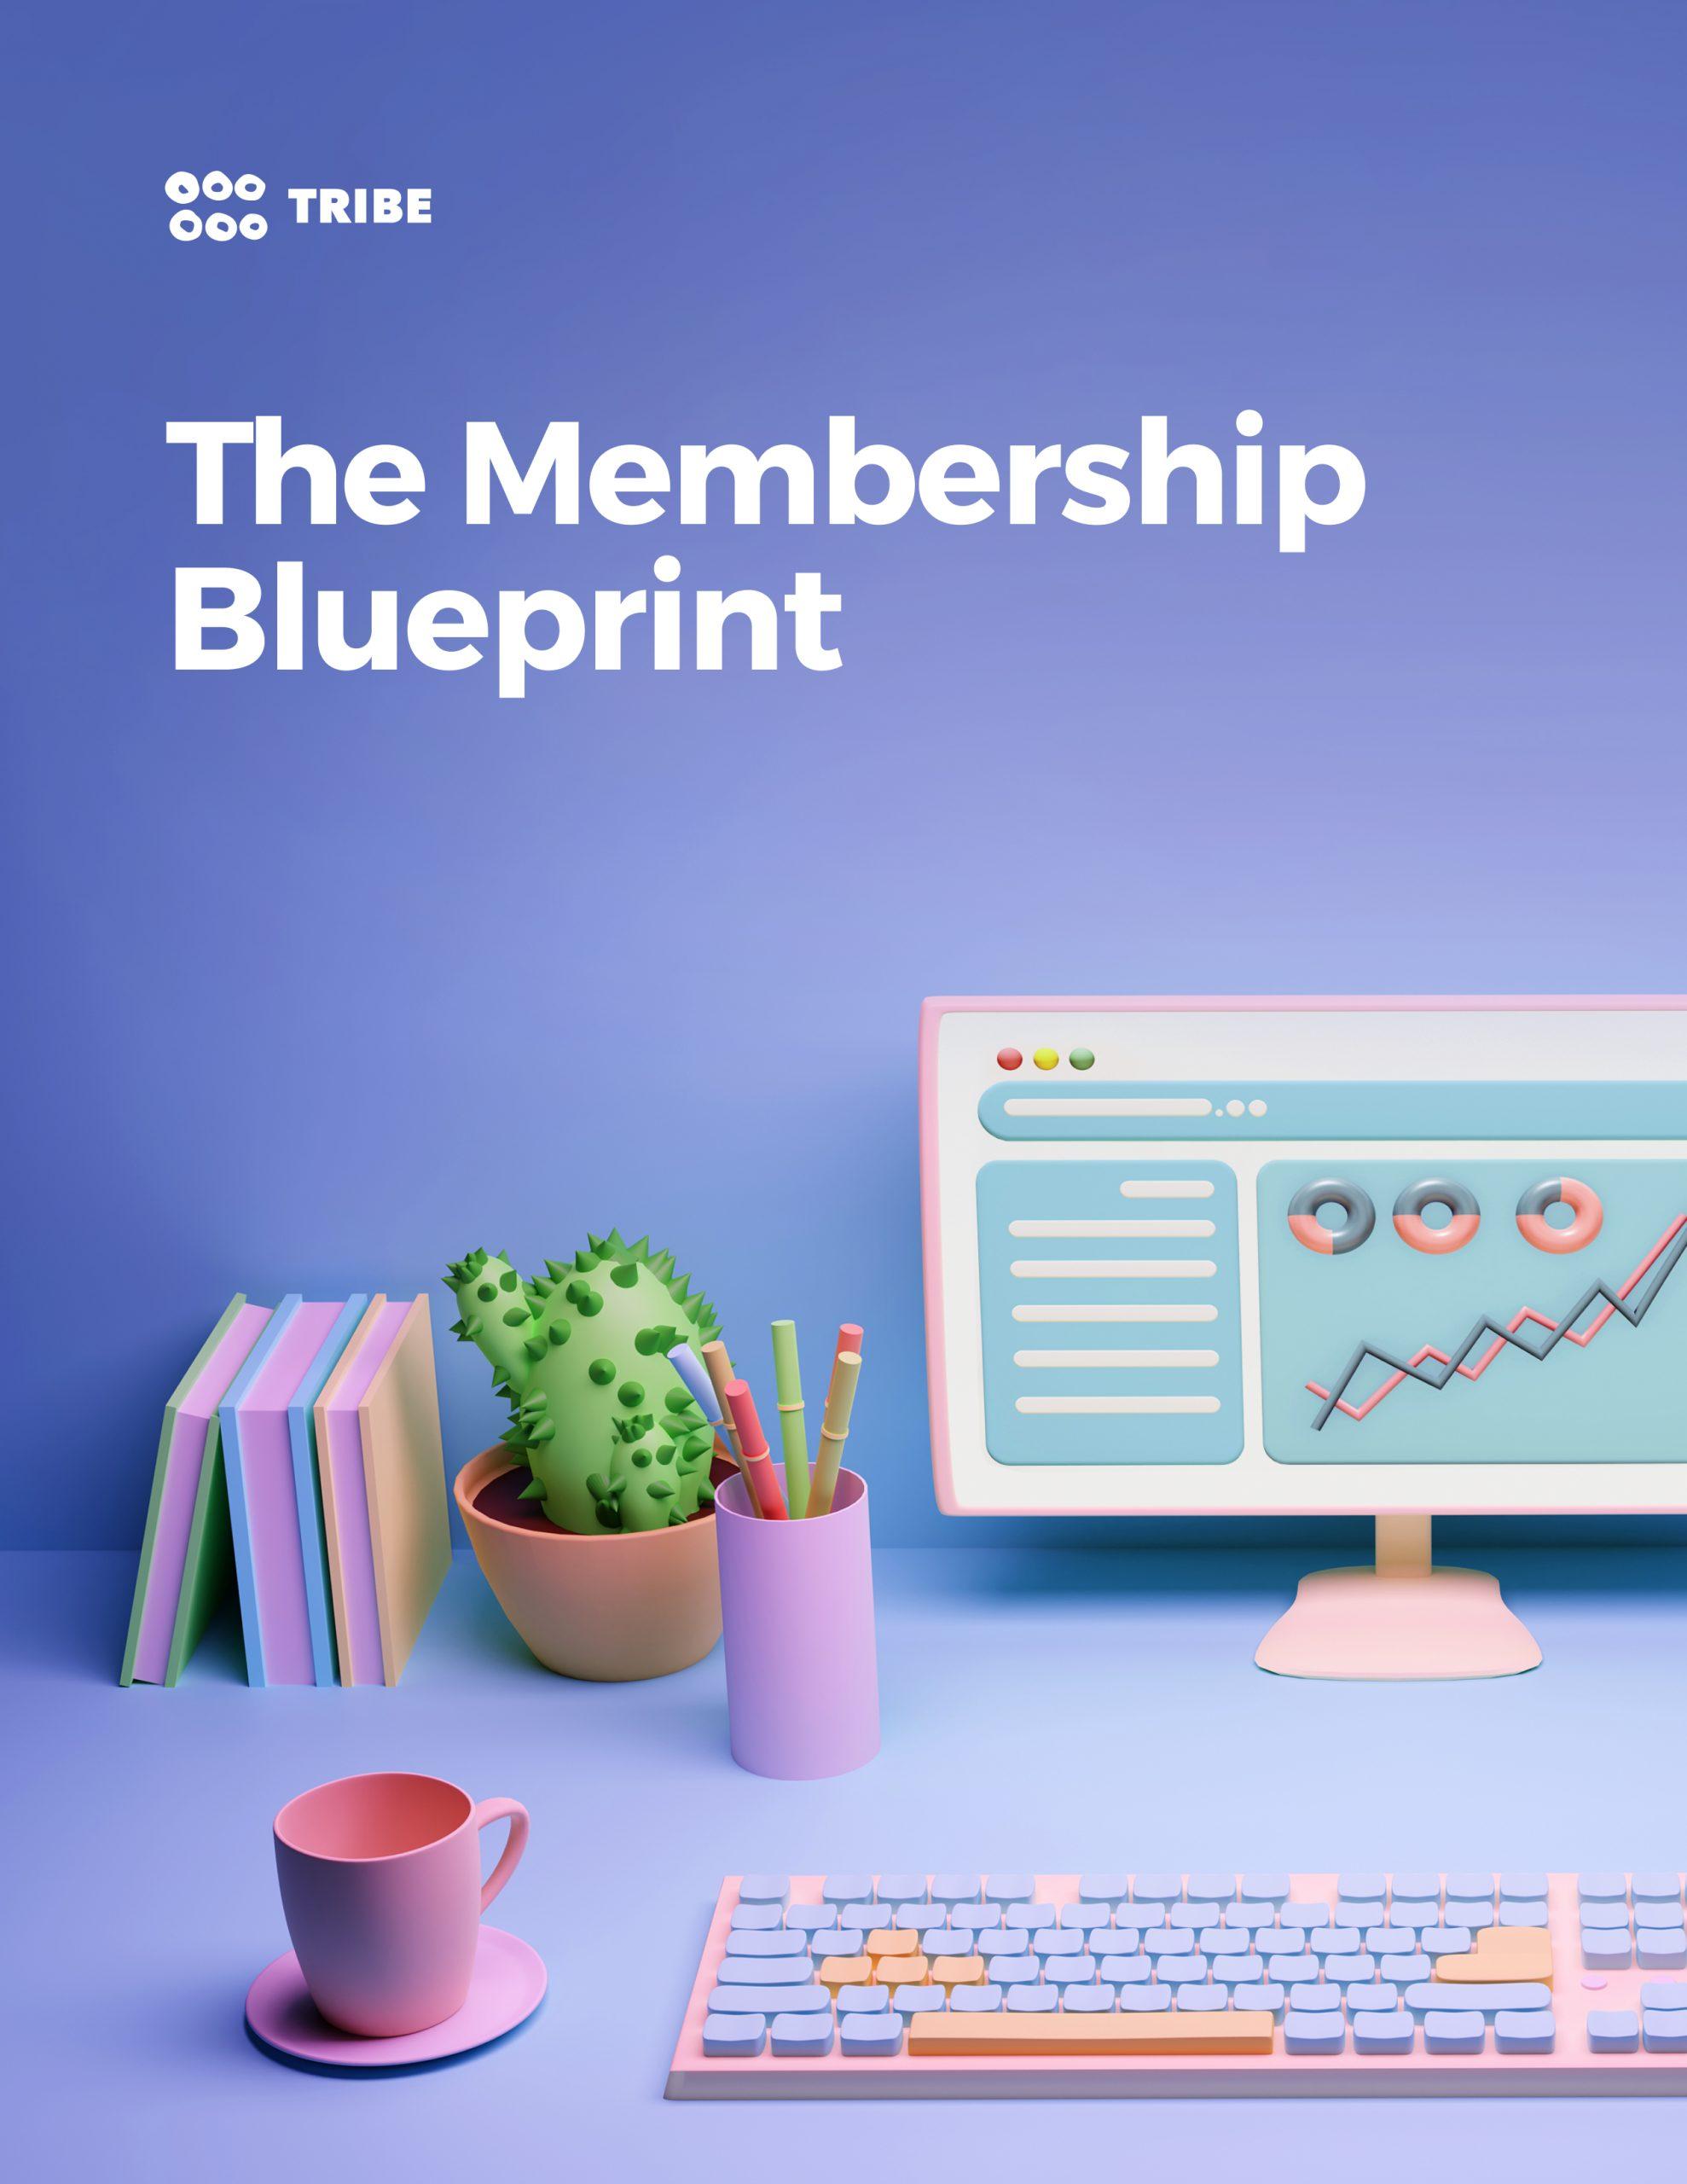 The Membership Blueprint